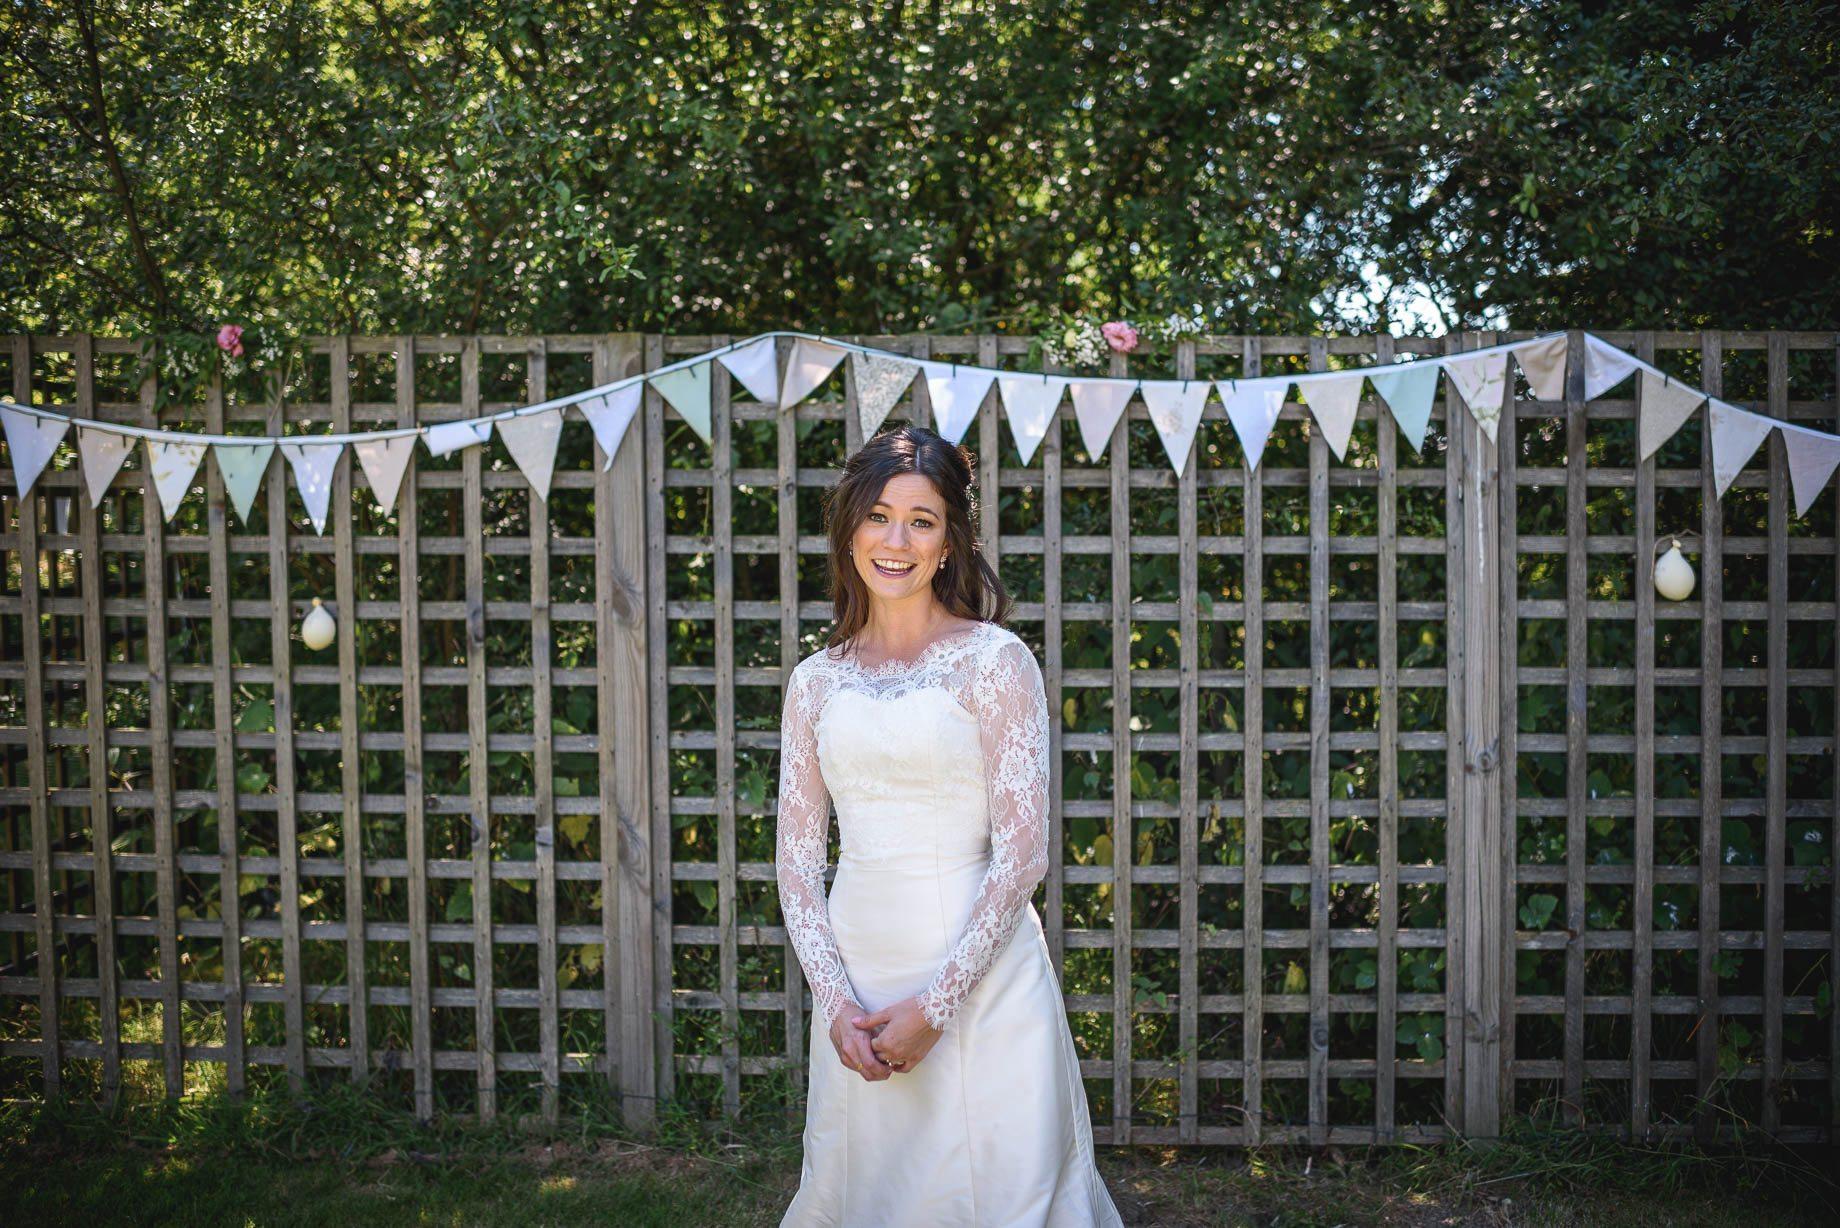 Gildings Barn wedding photography - Sarah and Steve (127 of 190)